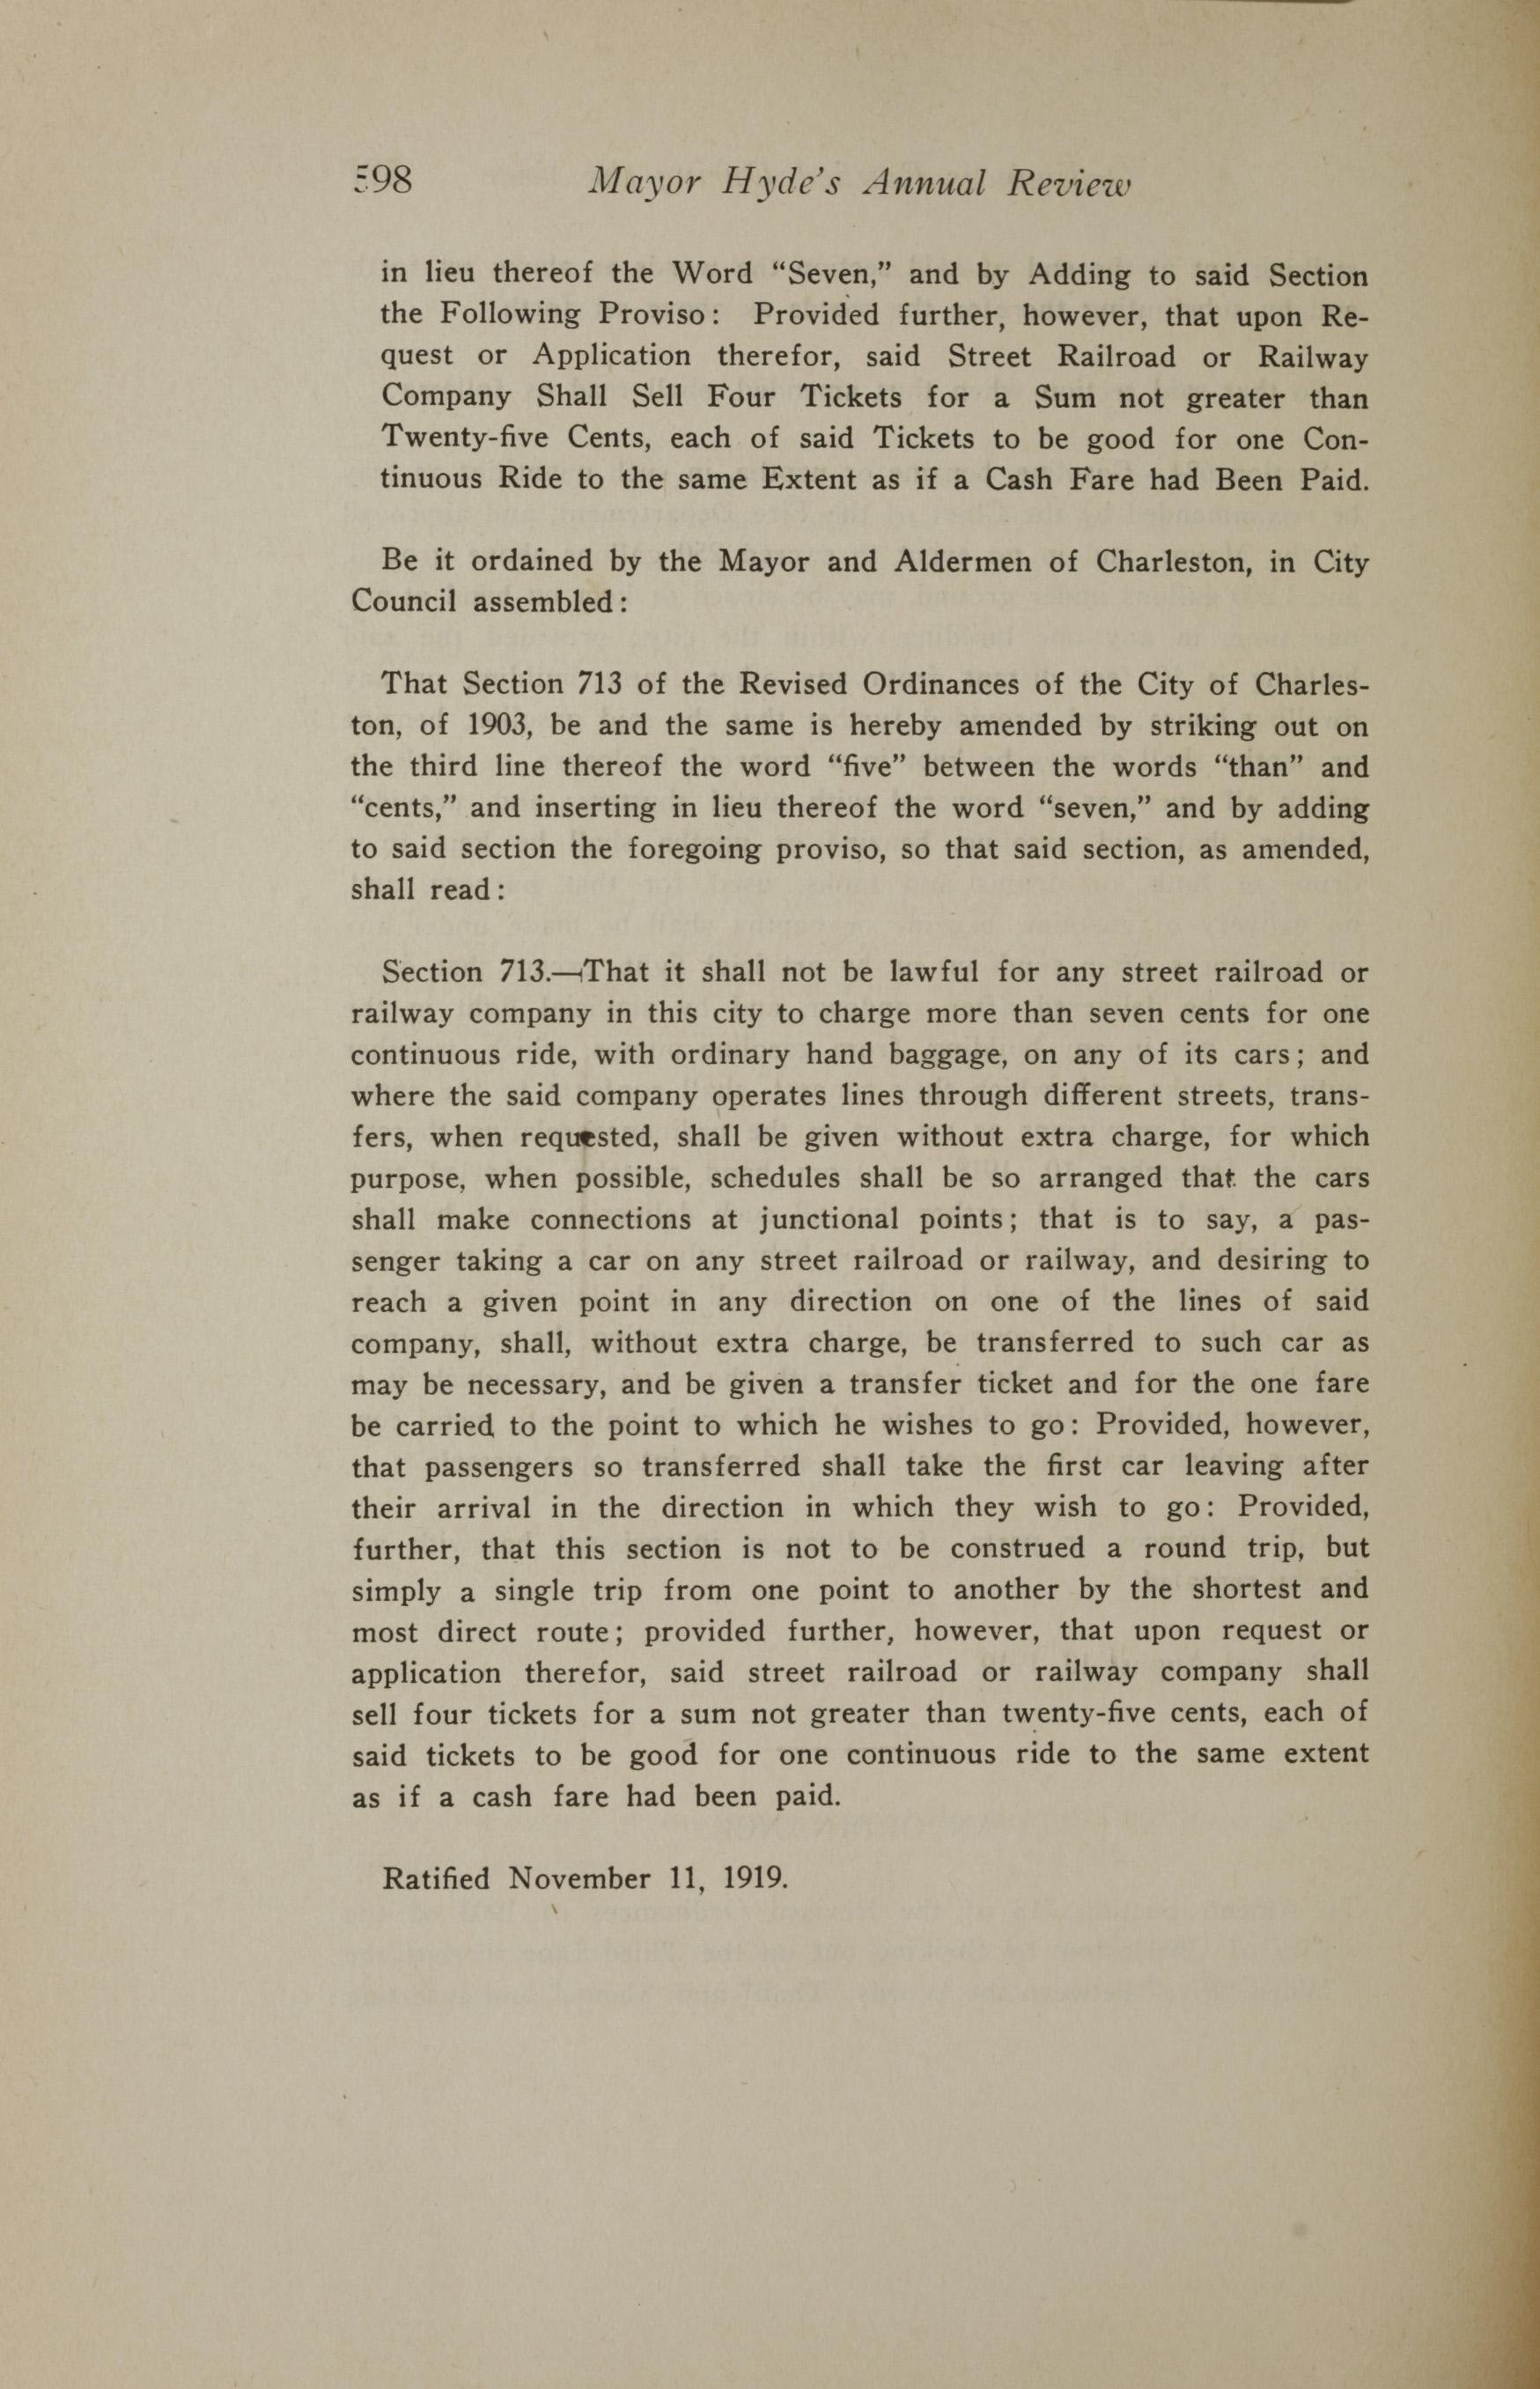 Charleston Yearbook, 1919, page 598